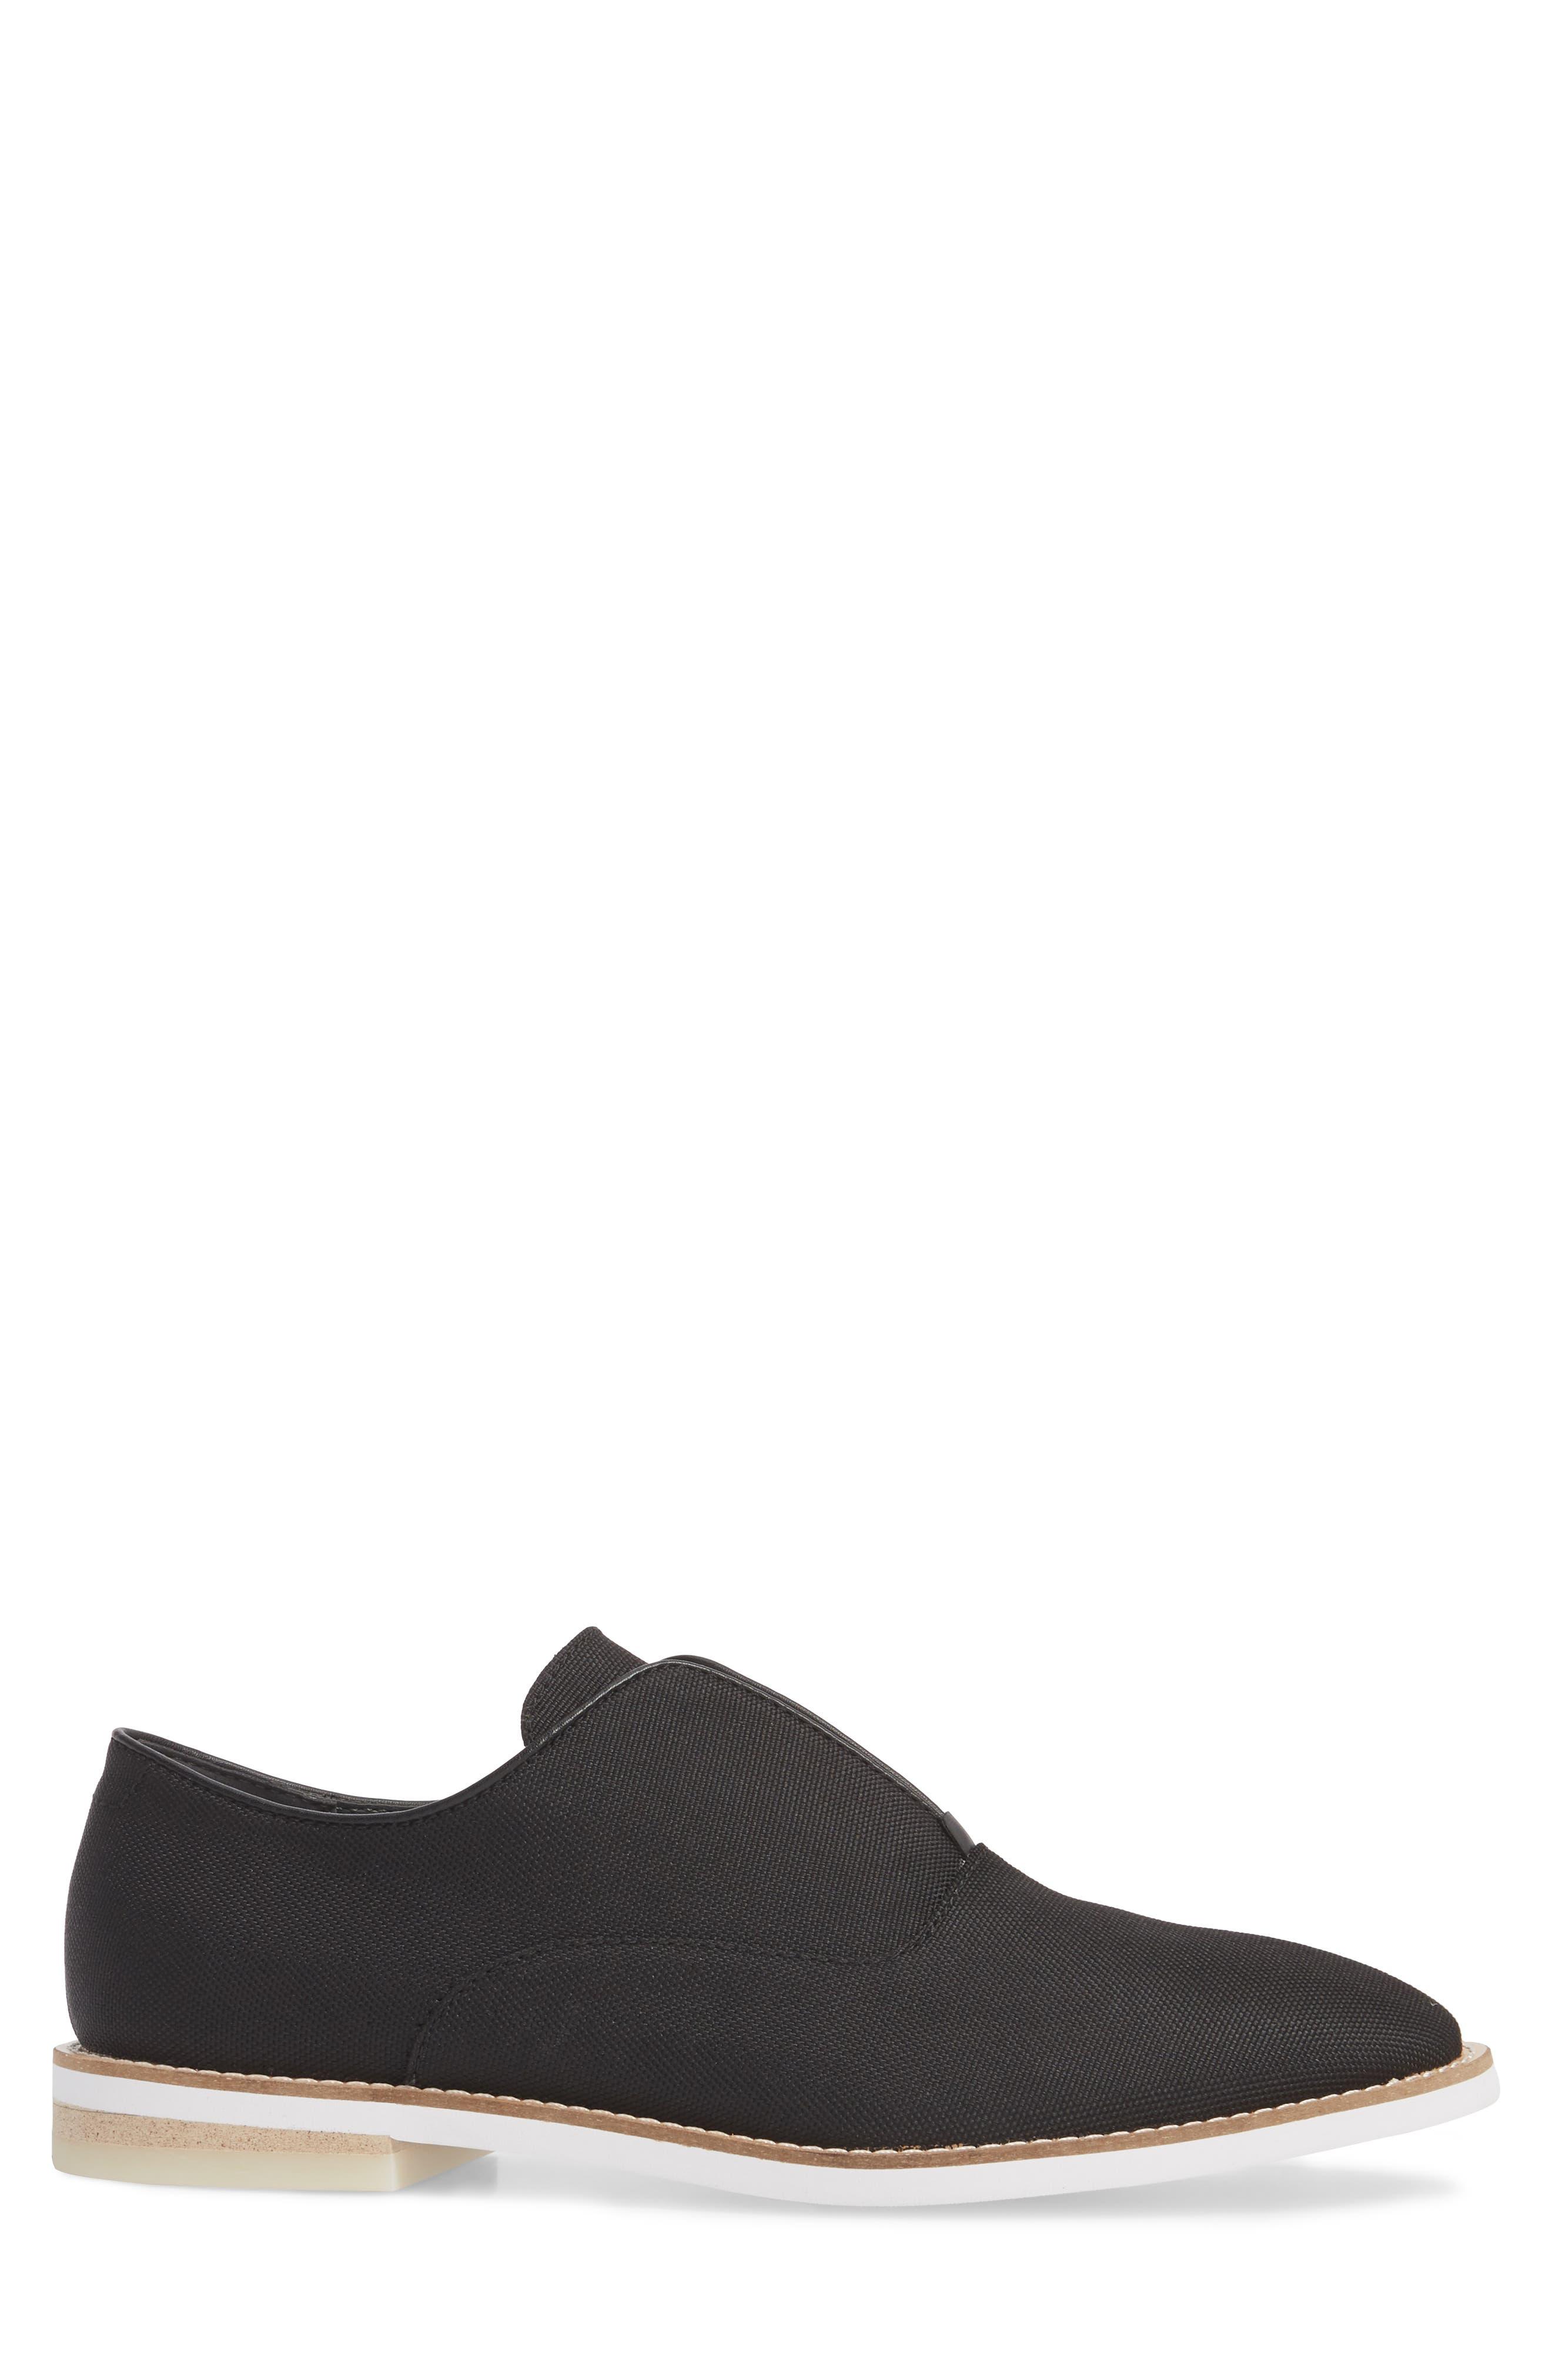 Auston Laceless Wingtip Oxford,                             Alternate thumbnail 3, color,                             Black Nylon